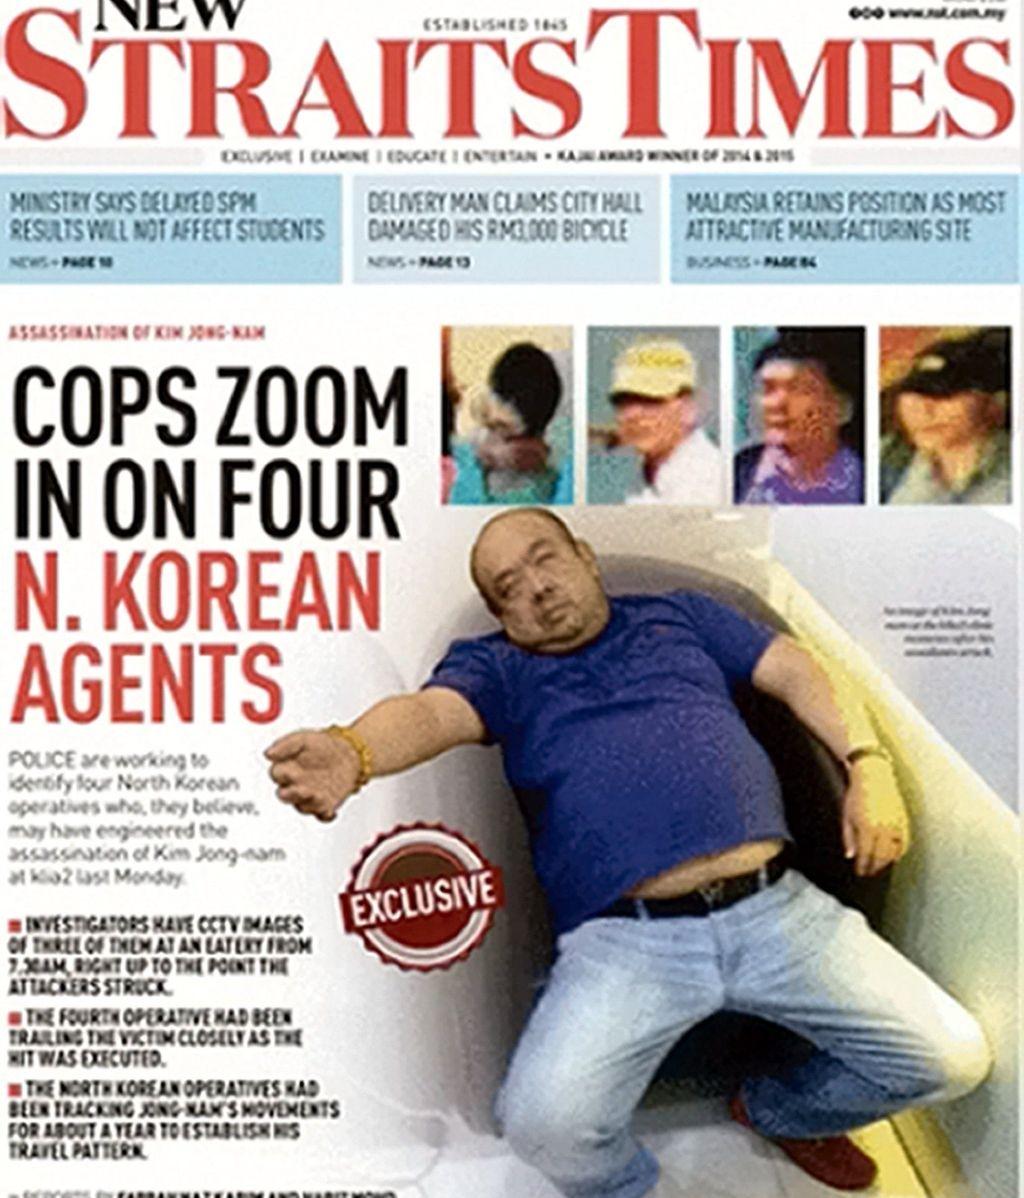 Portada New Straits Times